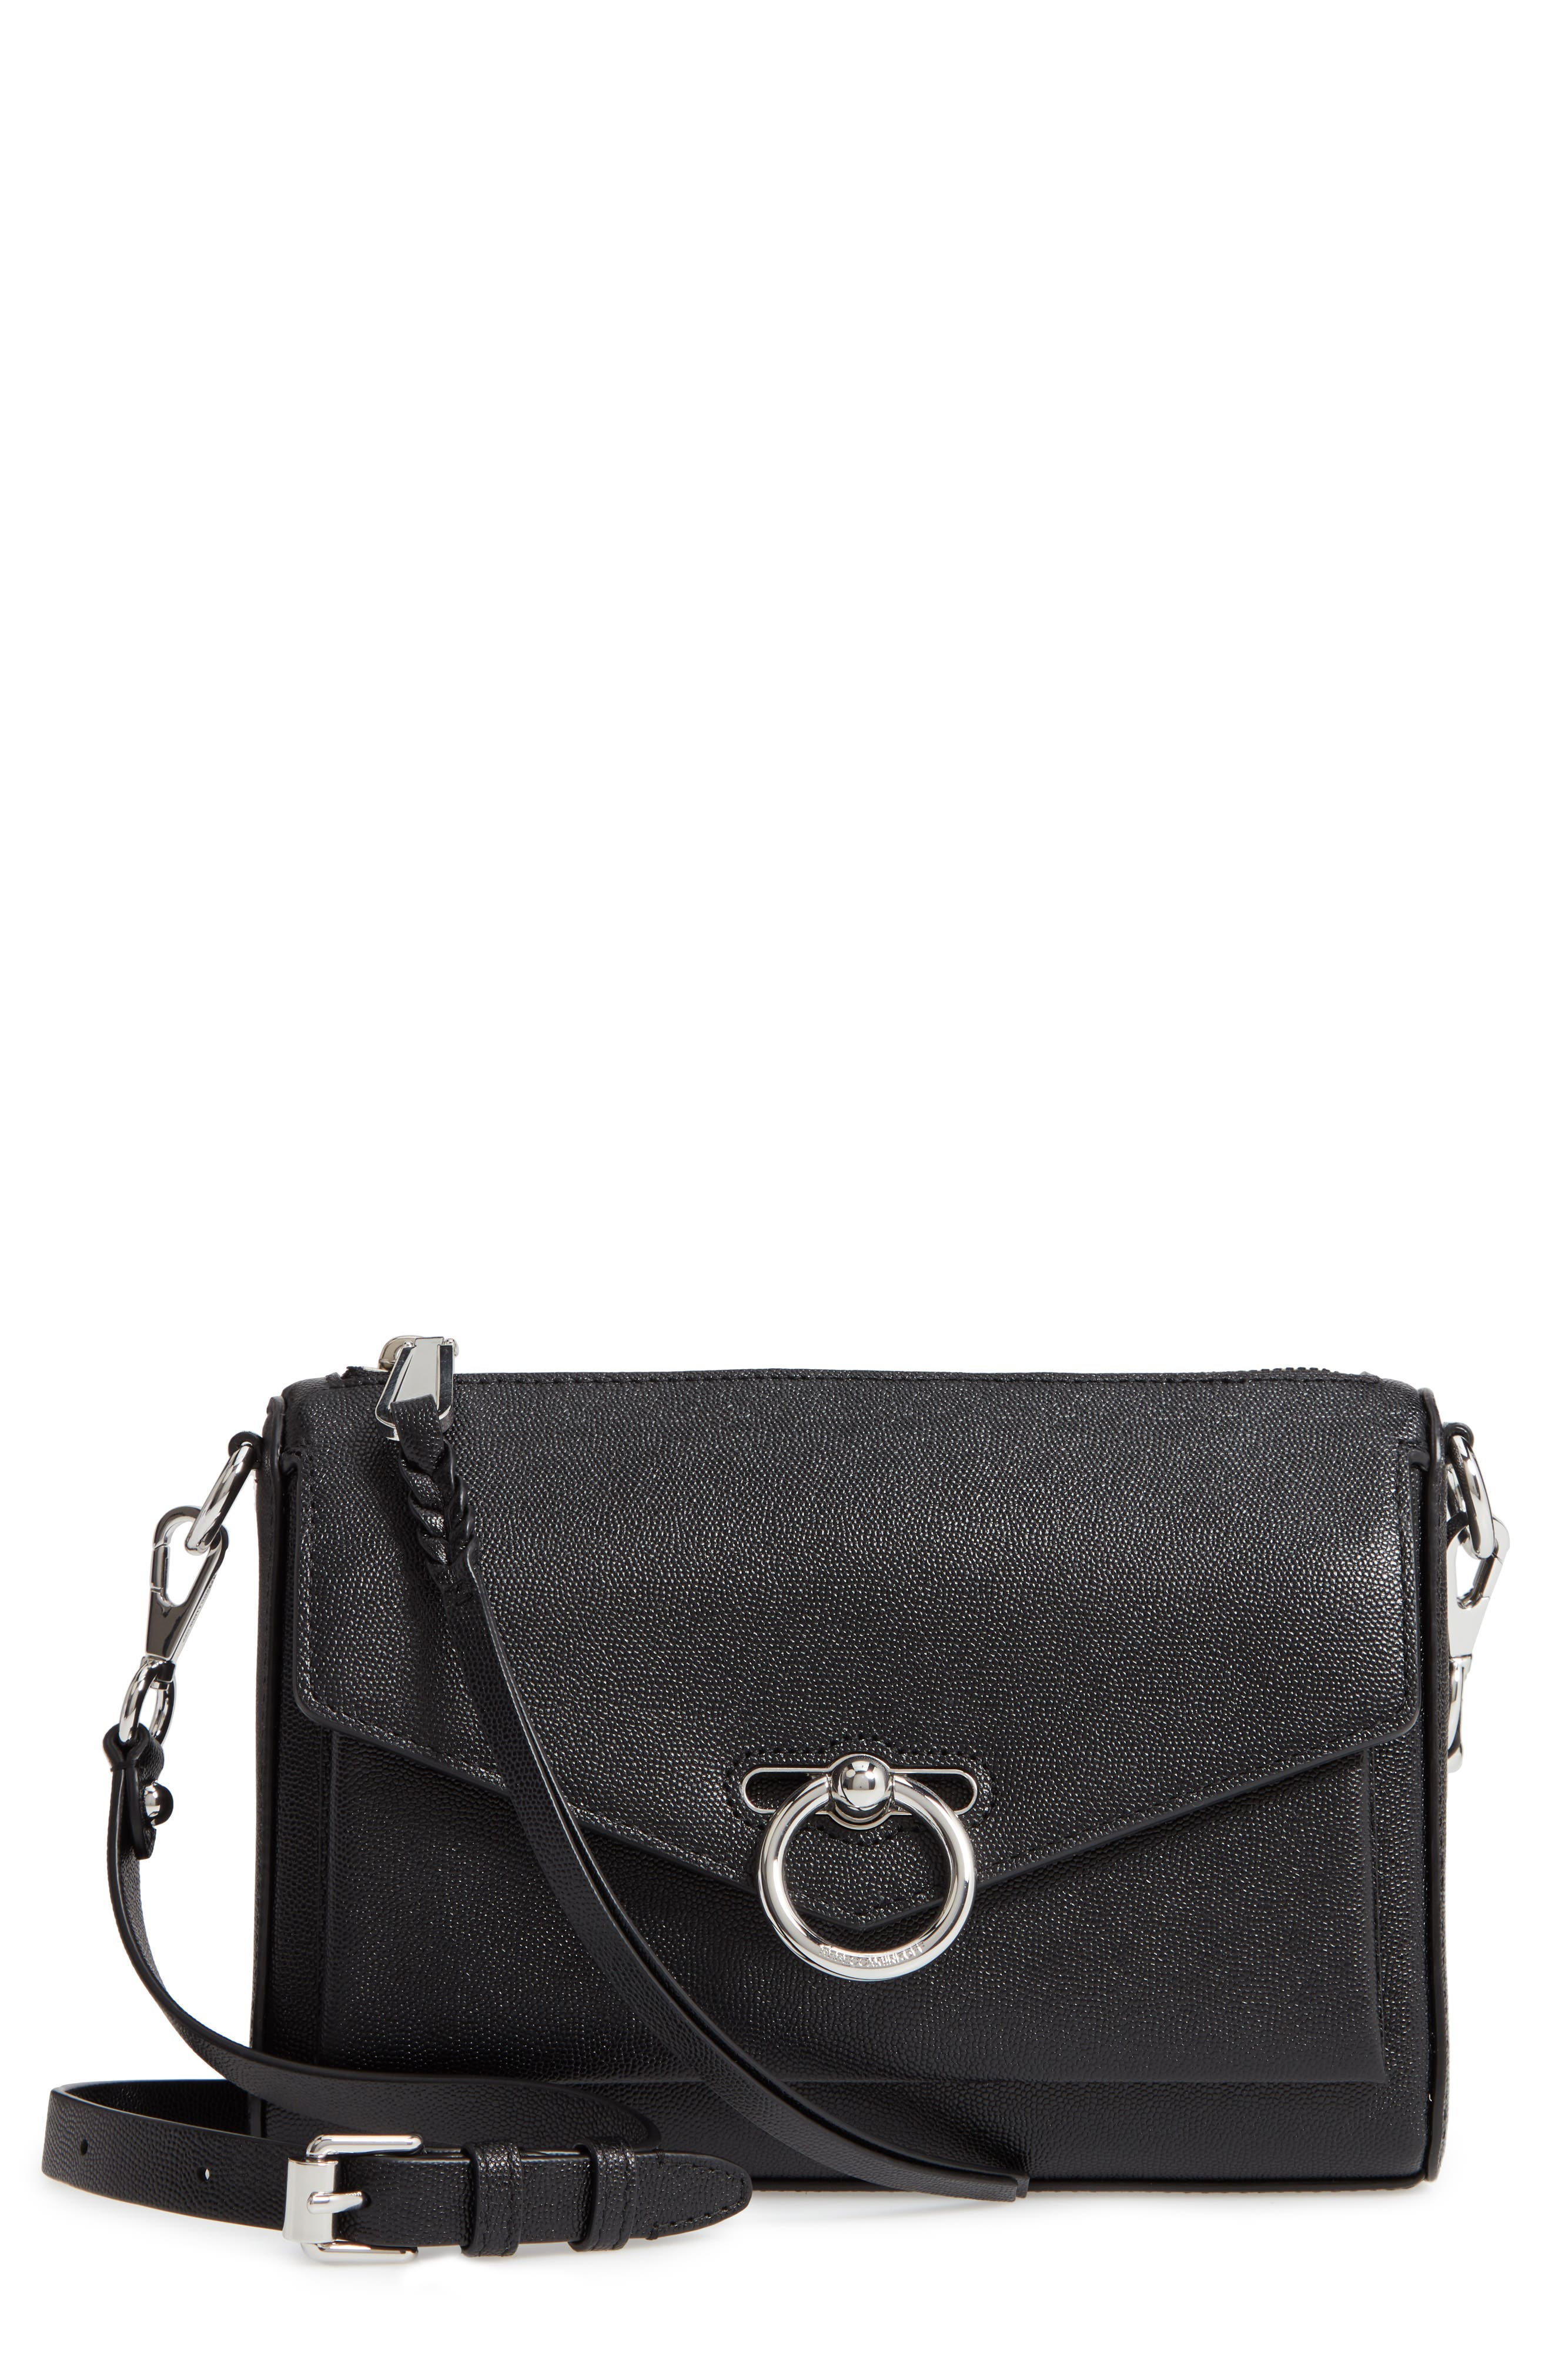 Jean MAC Convertible Crossbody Bag,                             Main thumbnail 1, color,                             BLACK